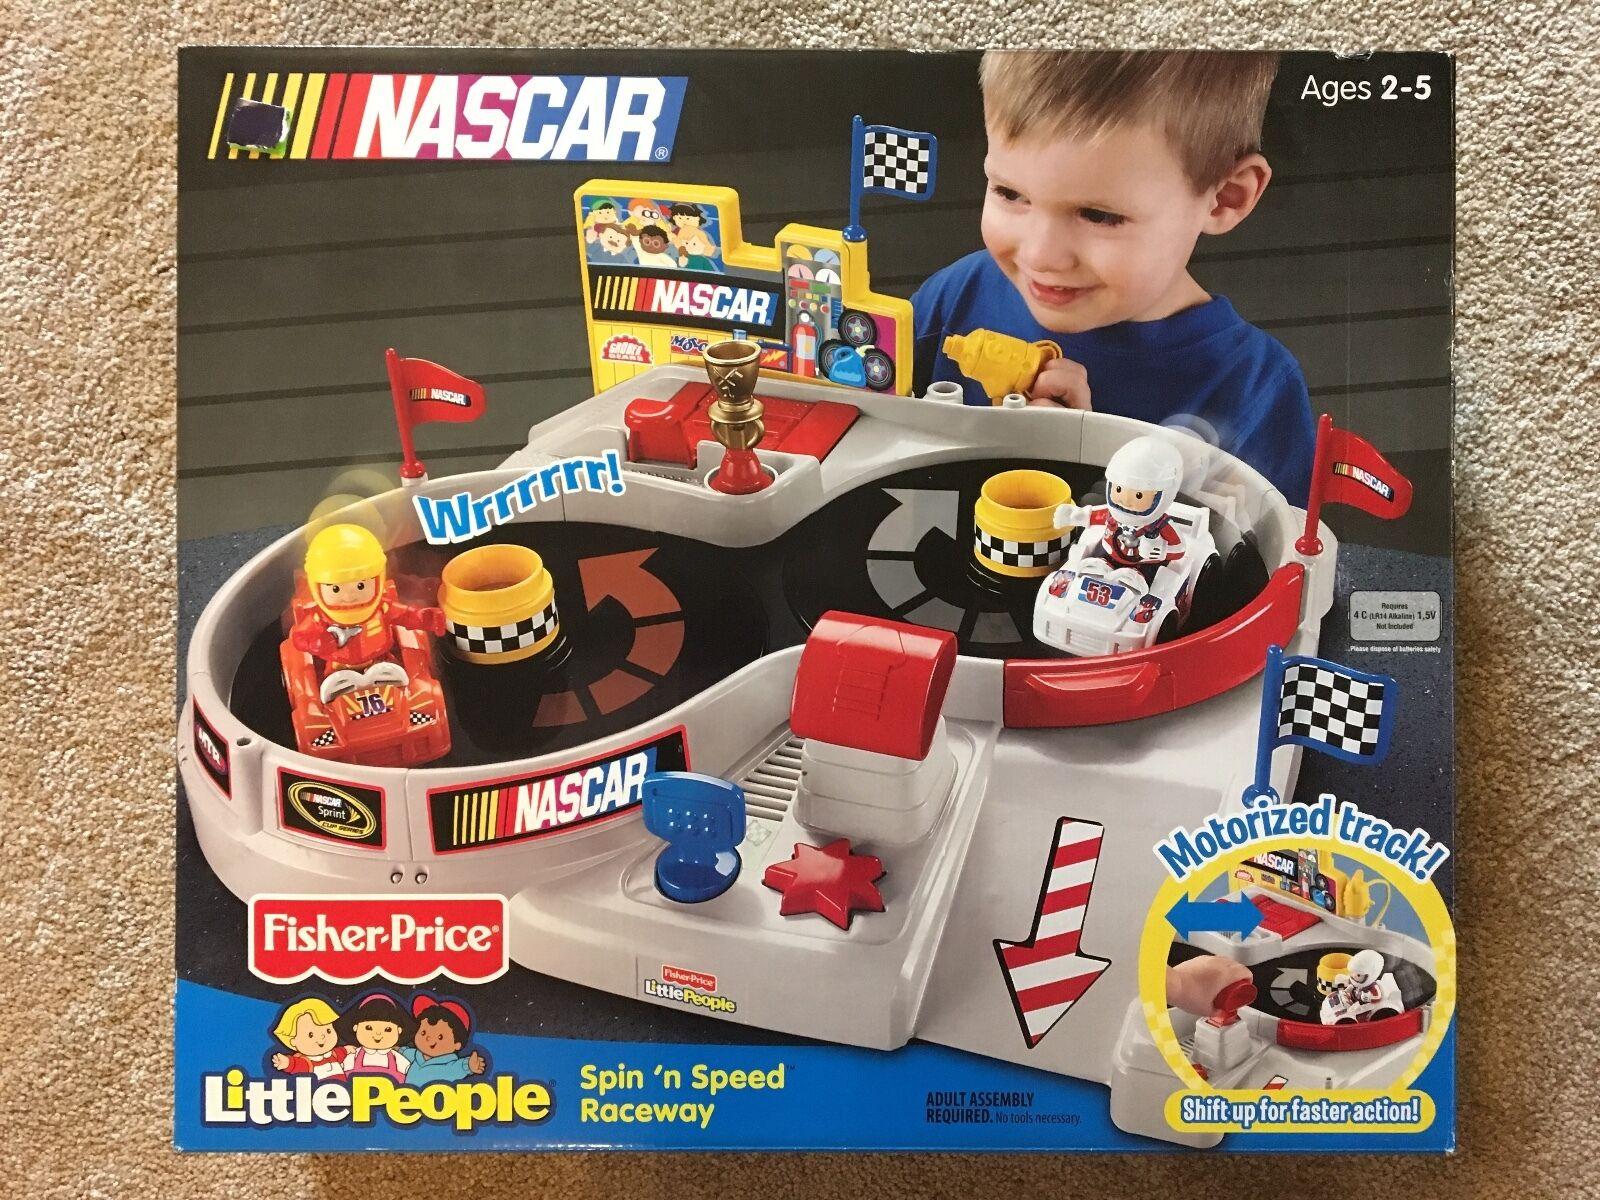 Fisher -Price liten människor NASbil Spin'N Speed Raceway KOLLEKTIVITEL  Ny i rutan